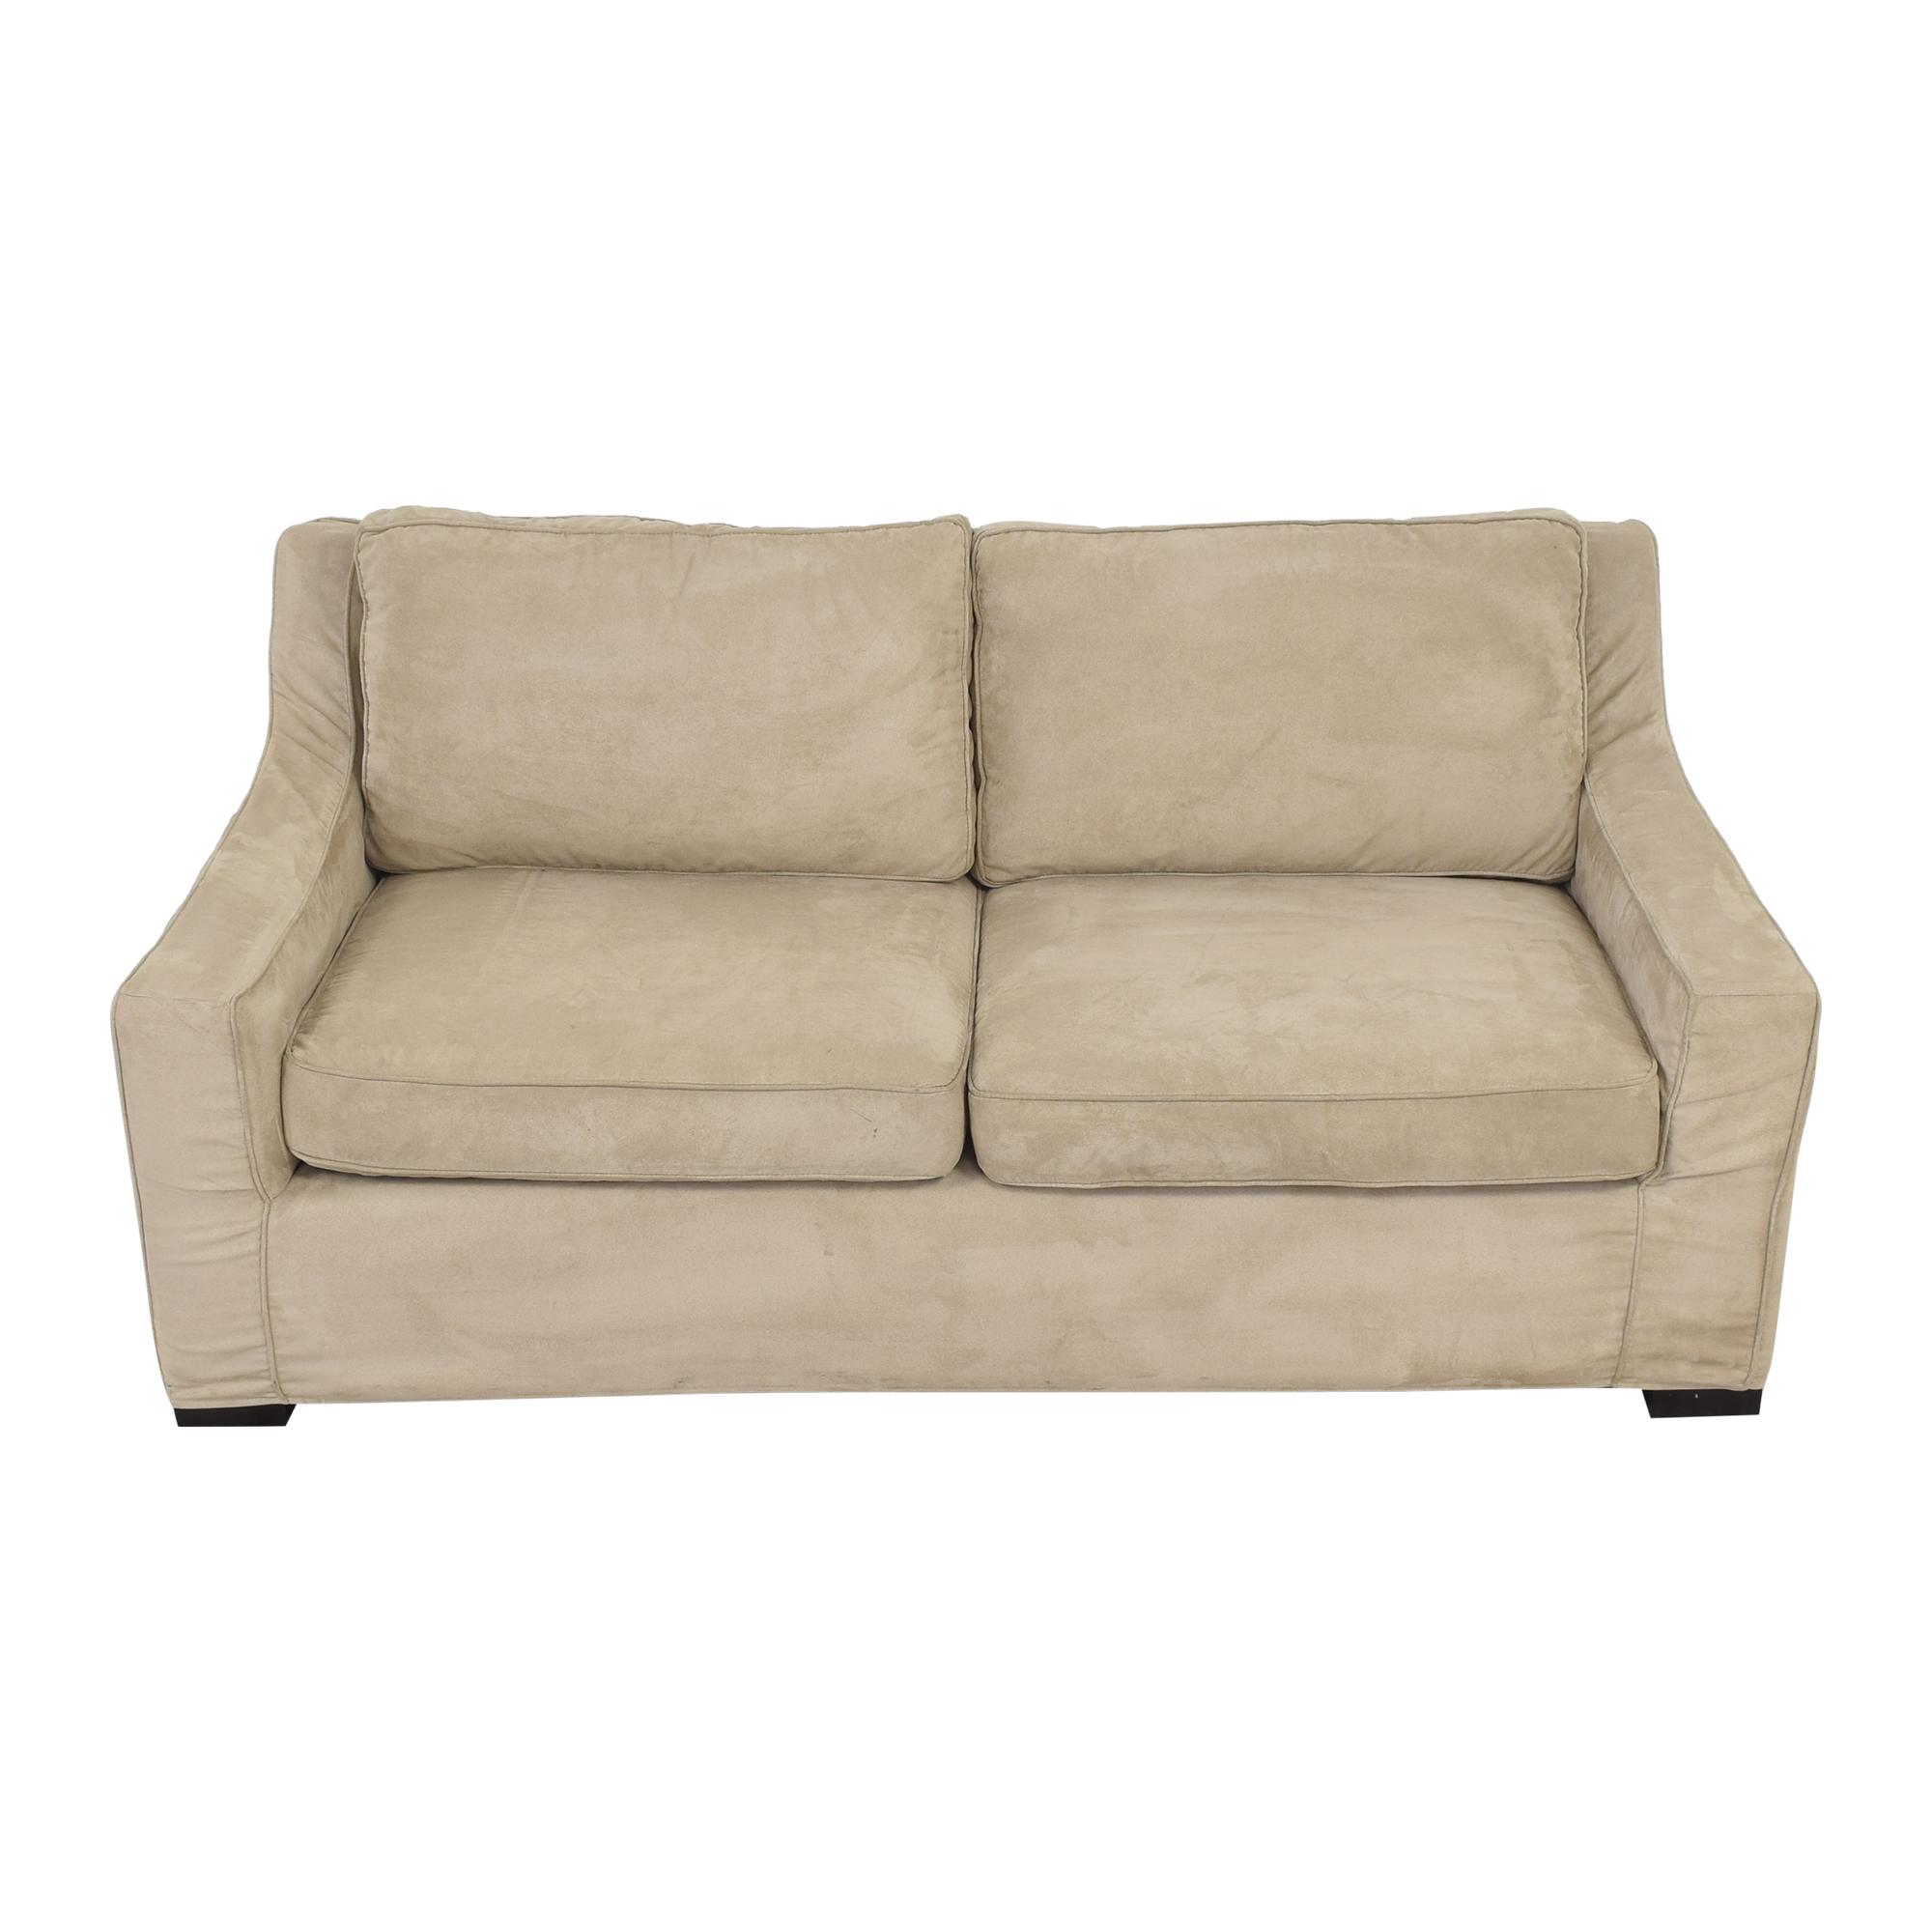 Crate & Barrel Two Cushion Sofa / Classic Sofas